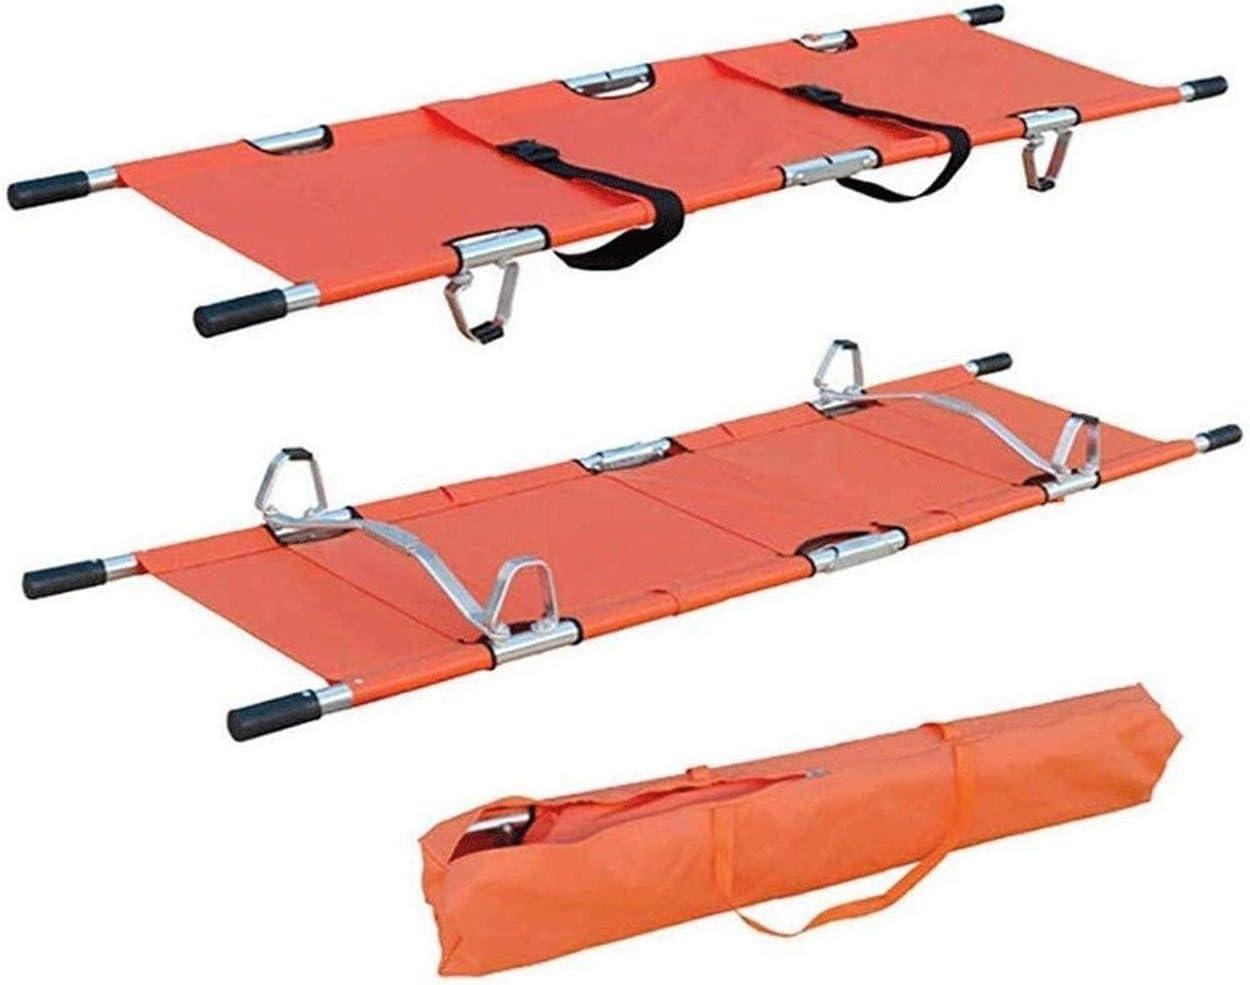 TONGSH Portable Emergency Folding Stretcher Medical Stretcher -